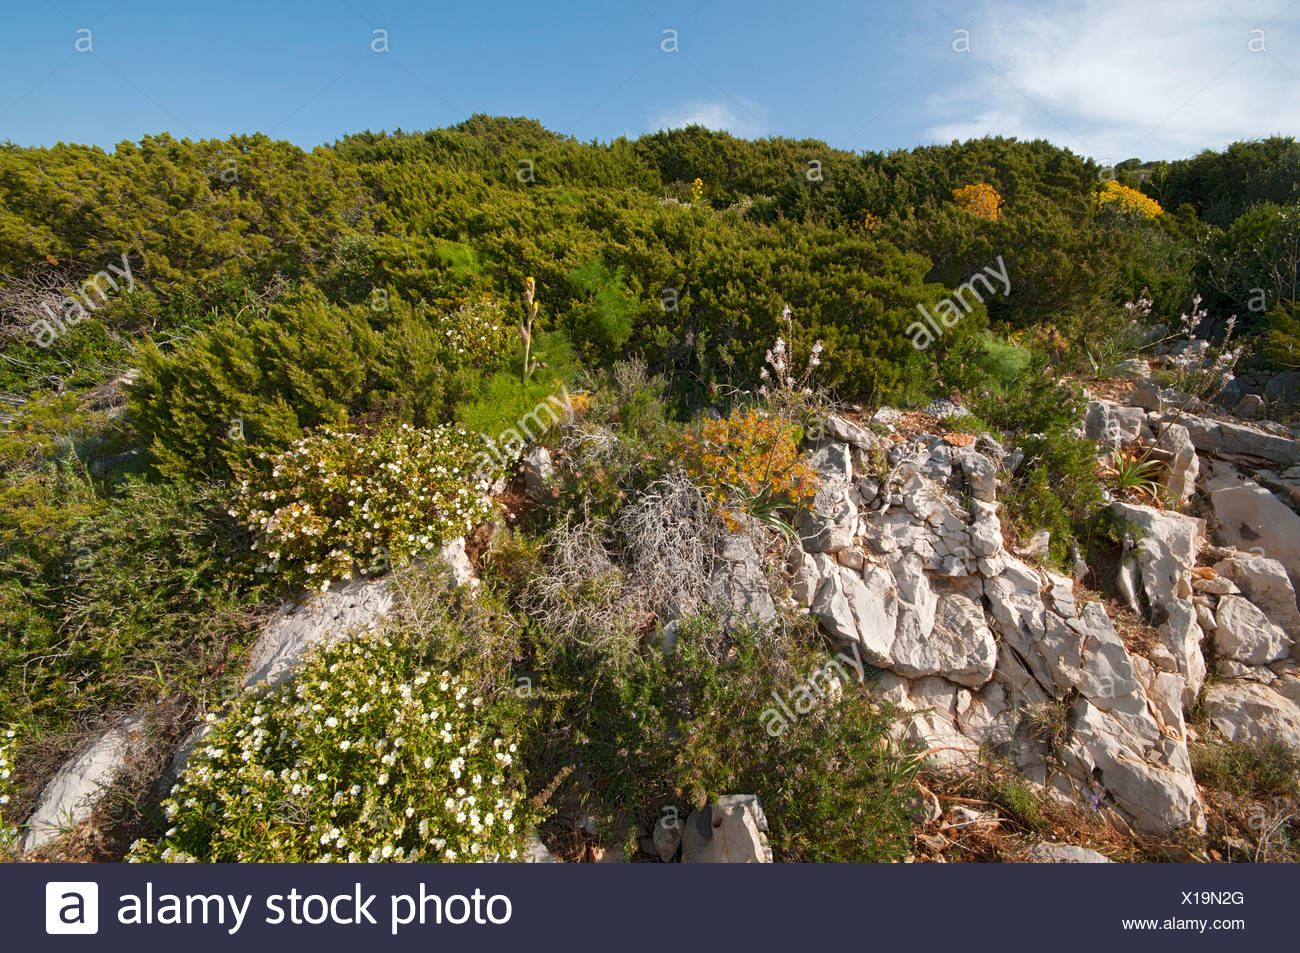 Macchia scrubland, Sardinia, Italy, Europe - Stock Image